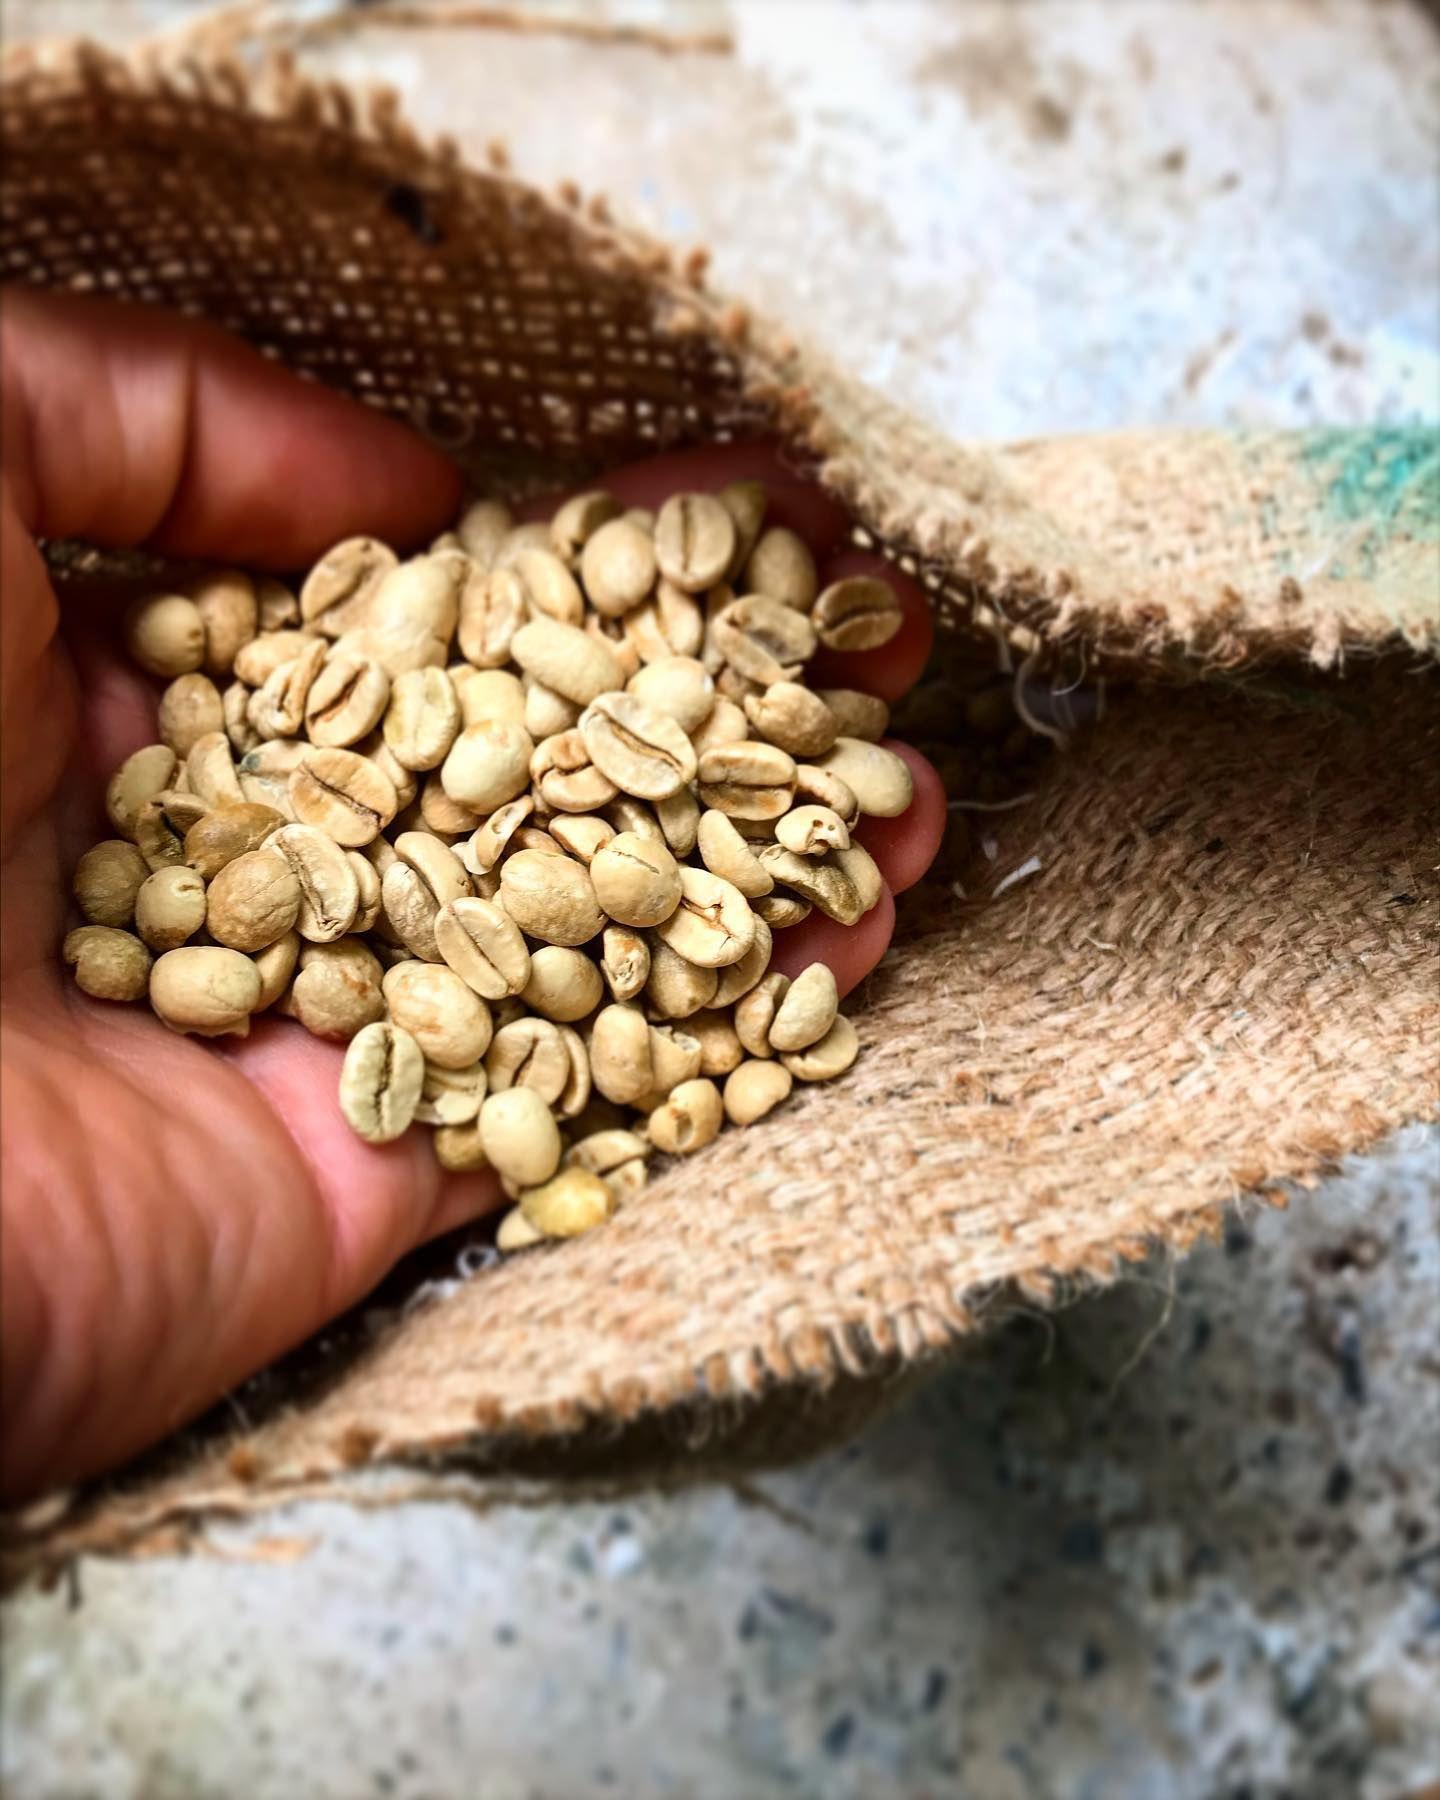 Aged coffee goes down surprisingly well        #coffee #coffeebeans #coffeelifestyle #coffeeroasters #greenbeans #artisancoffee #independentcoffee #specialitycoffee #coffeeaddict #coffeetime #butfirstcoffee #wales #coffeeholic #coffeeaddict #coffeegram #coffeelove #barista #baristalife #coffeelover #coffeelovers #coffeeoftheday #instacoffee #hotgingerguys #coffeeshots #라떼 #아이스아메리카노 #shrewsbury